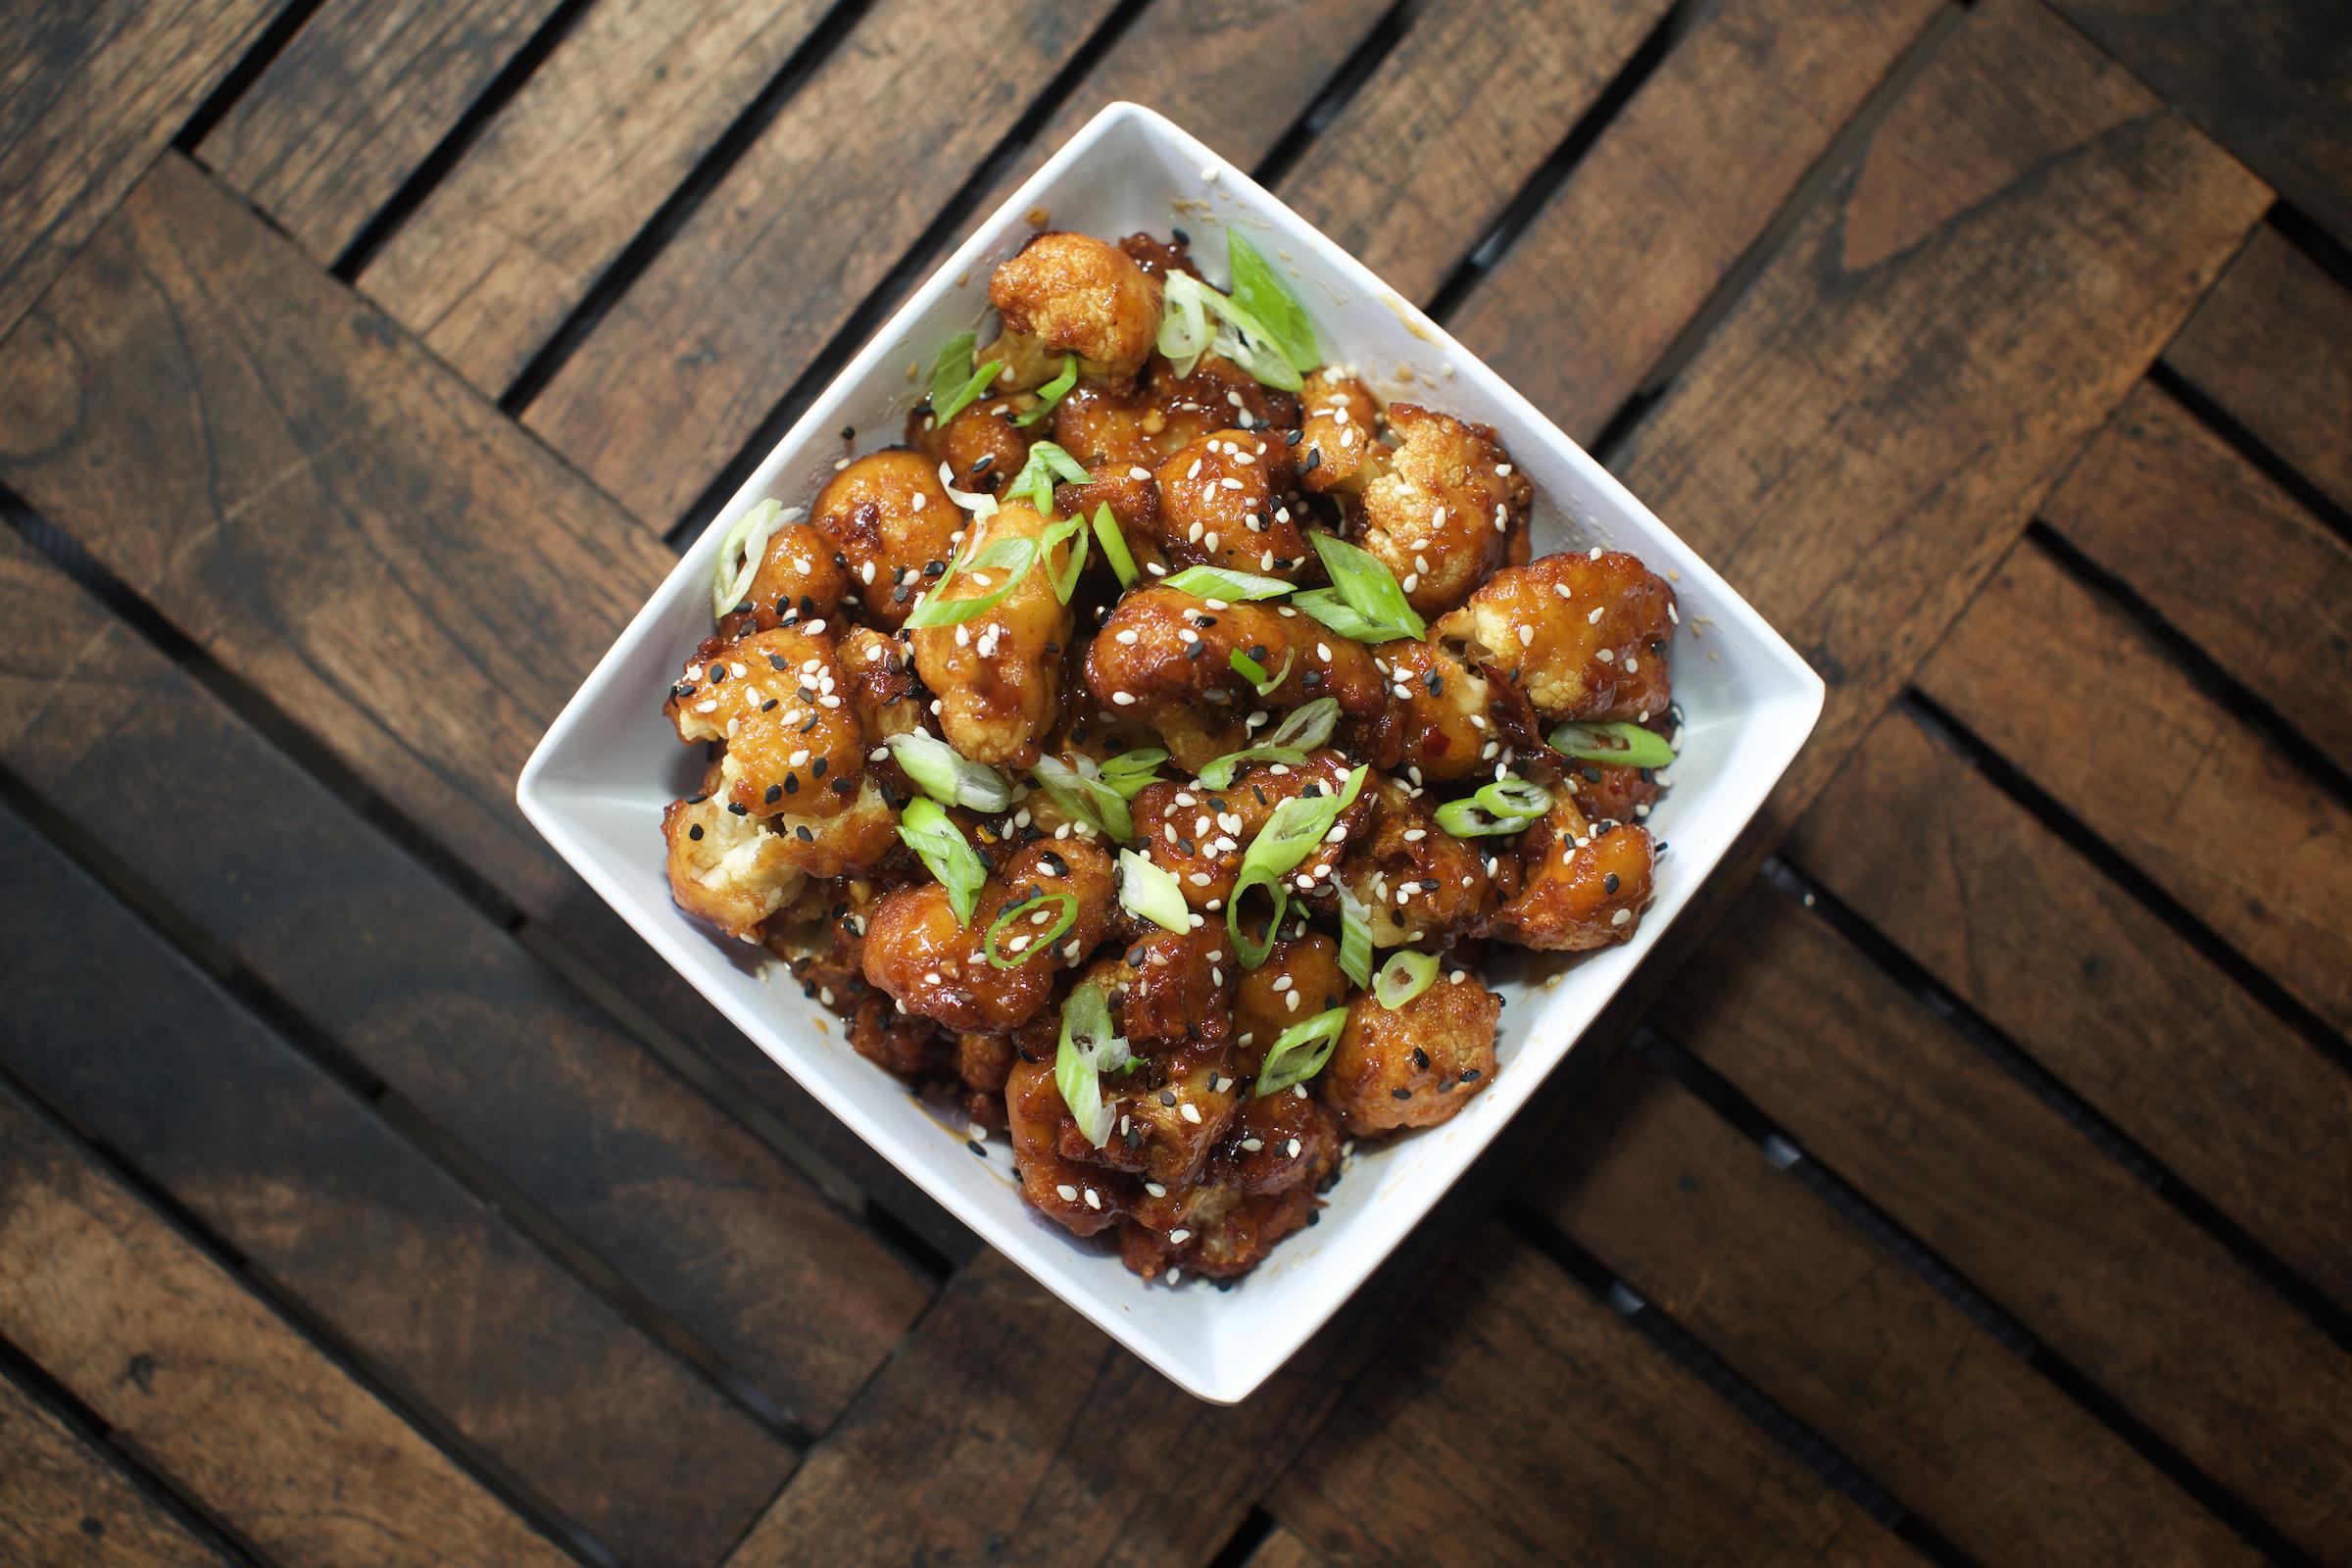 Gen Tso's Cauliflower